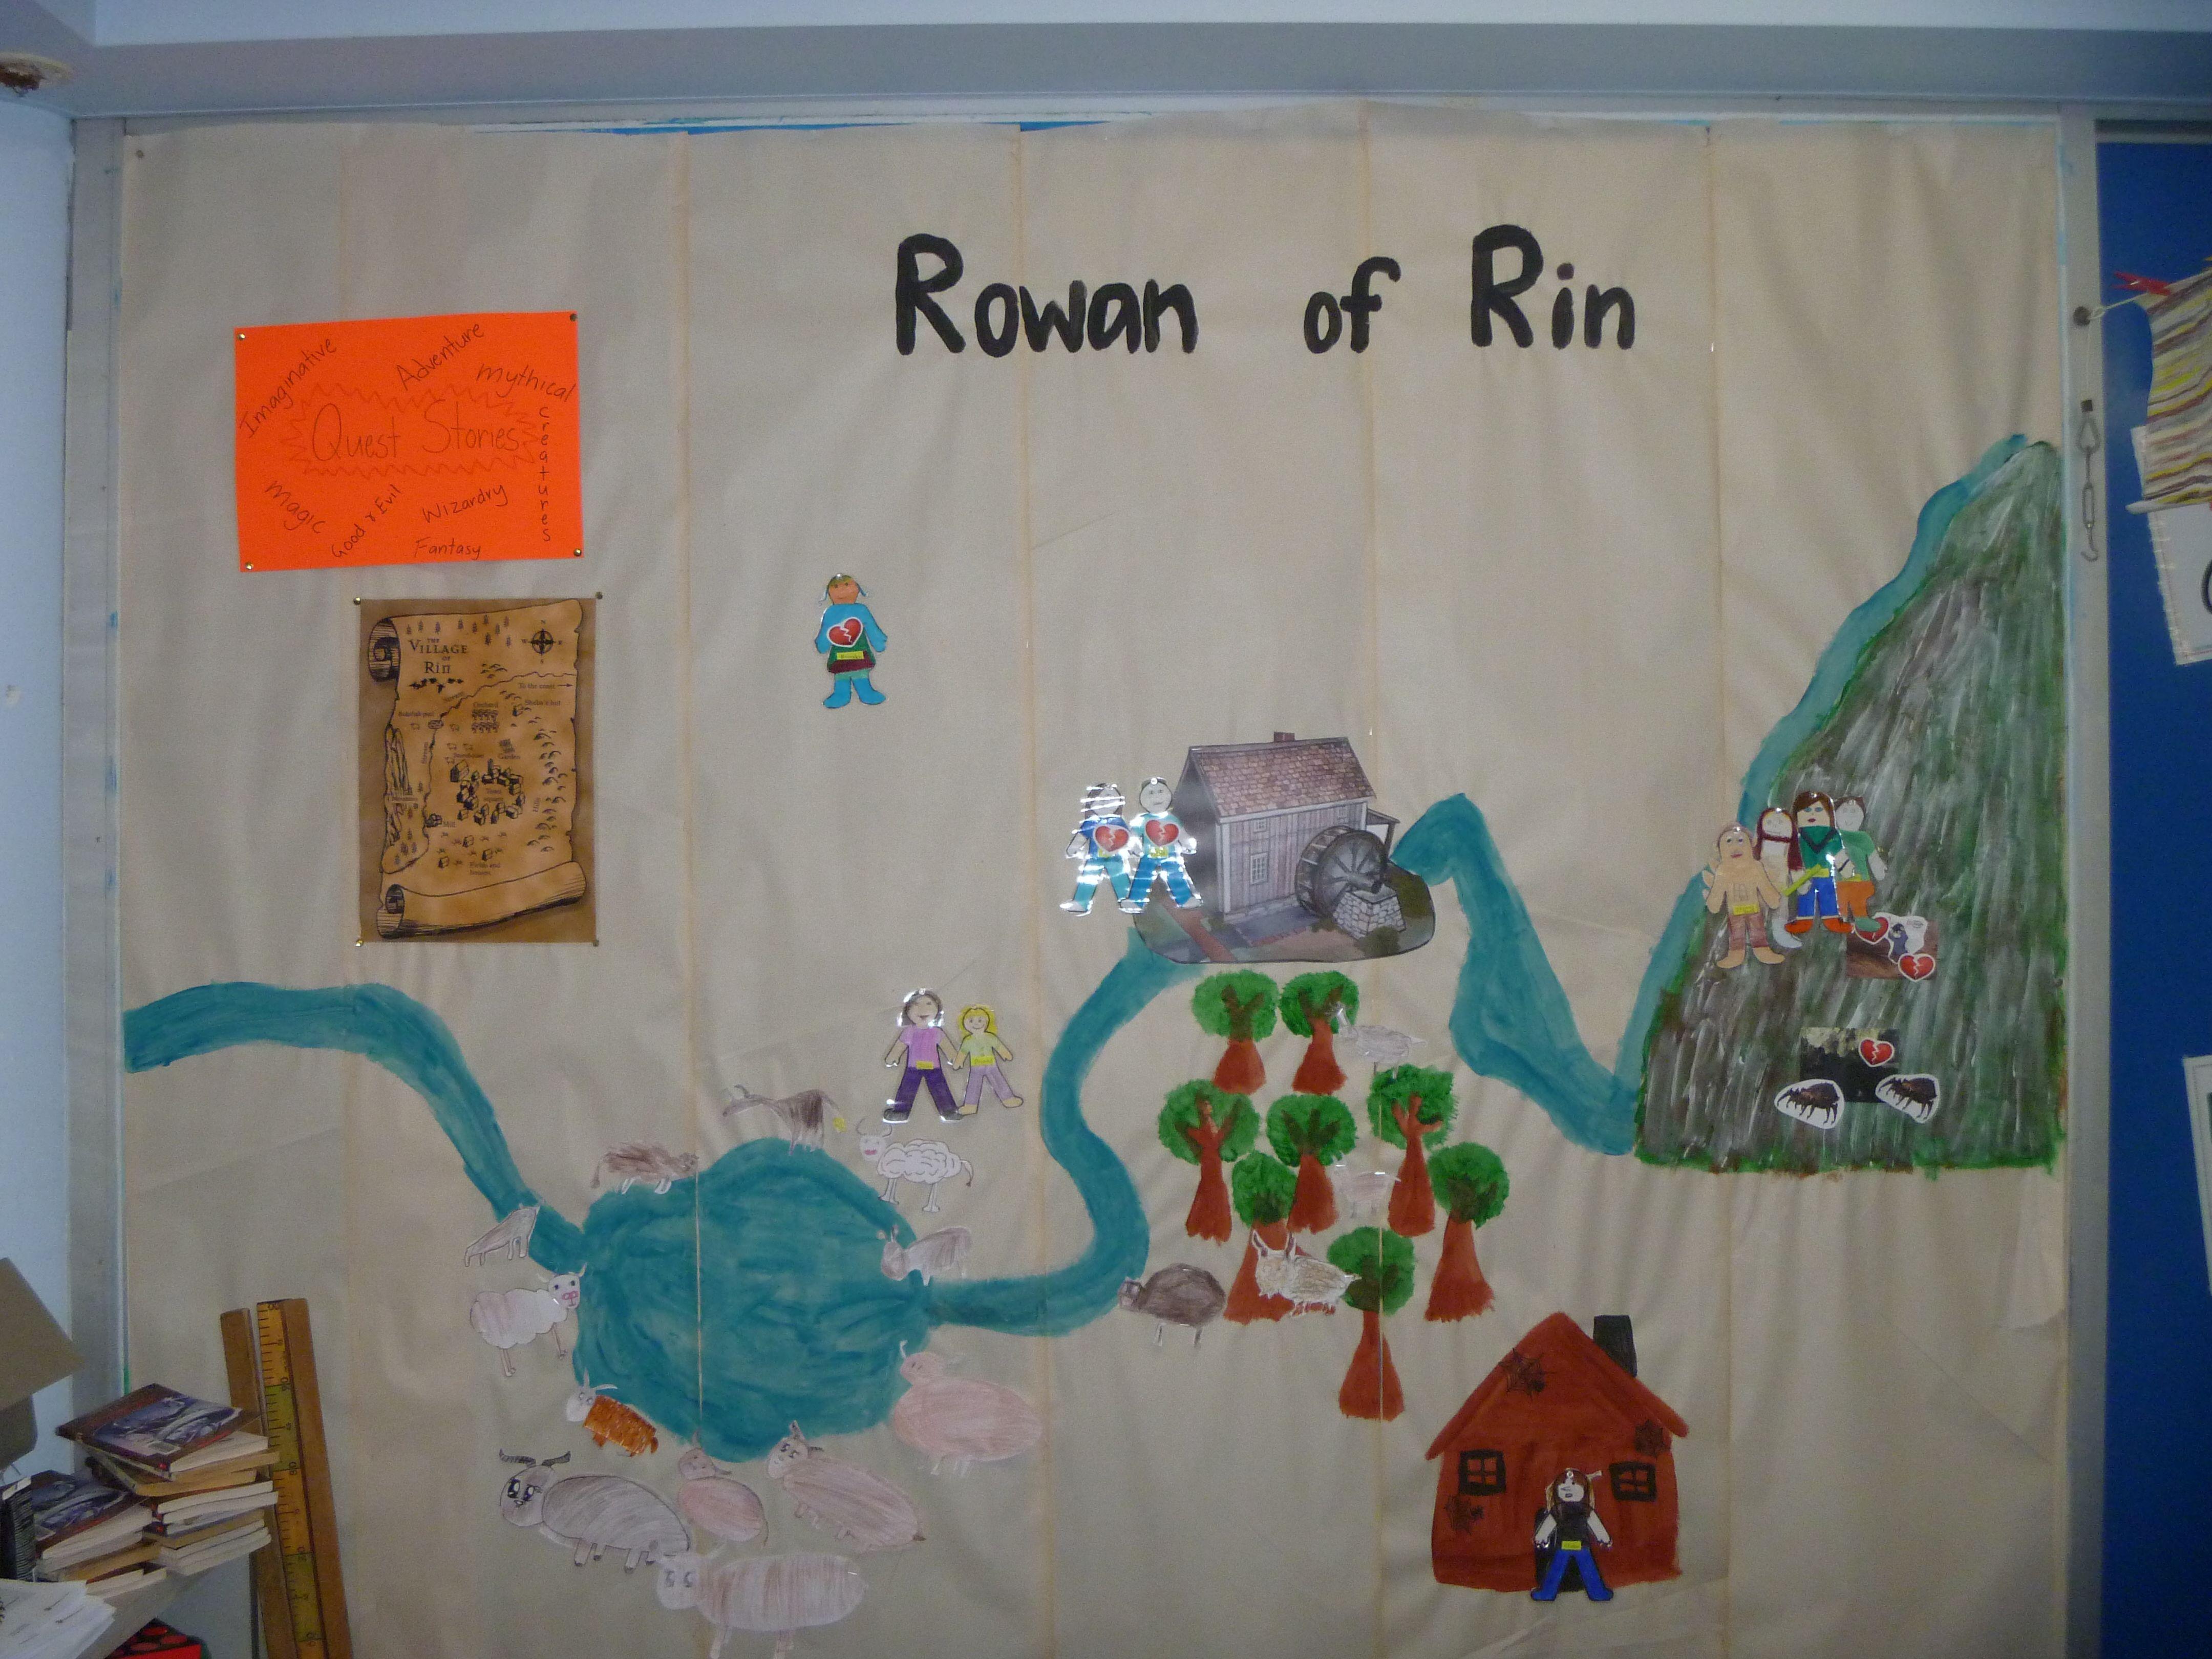 Rowan Of Rin Create A Rowan Of Rin Wall With Your Students